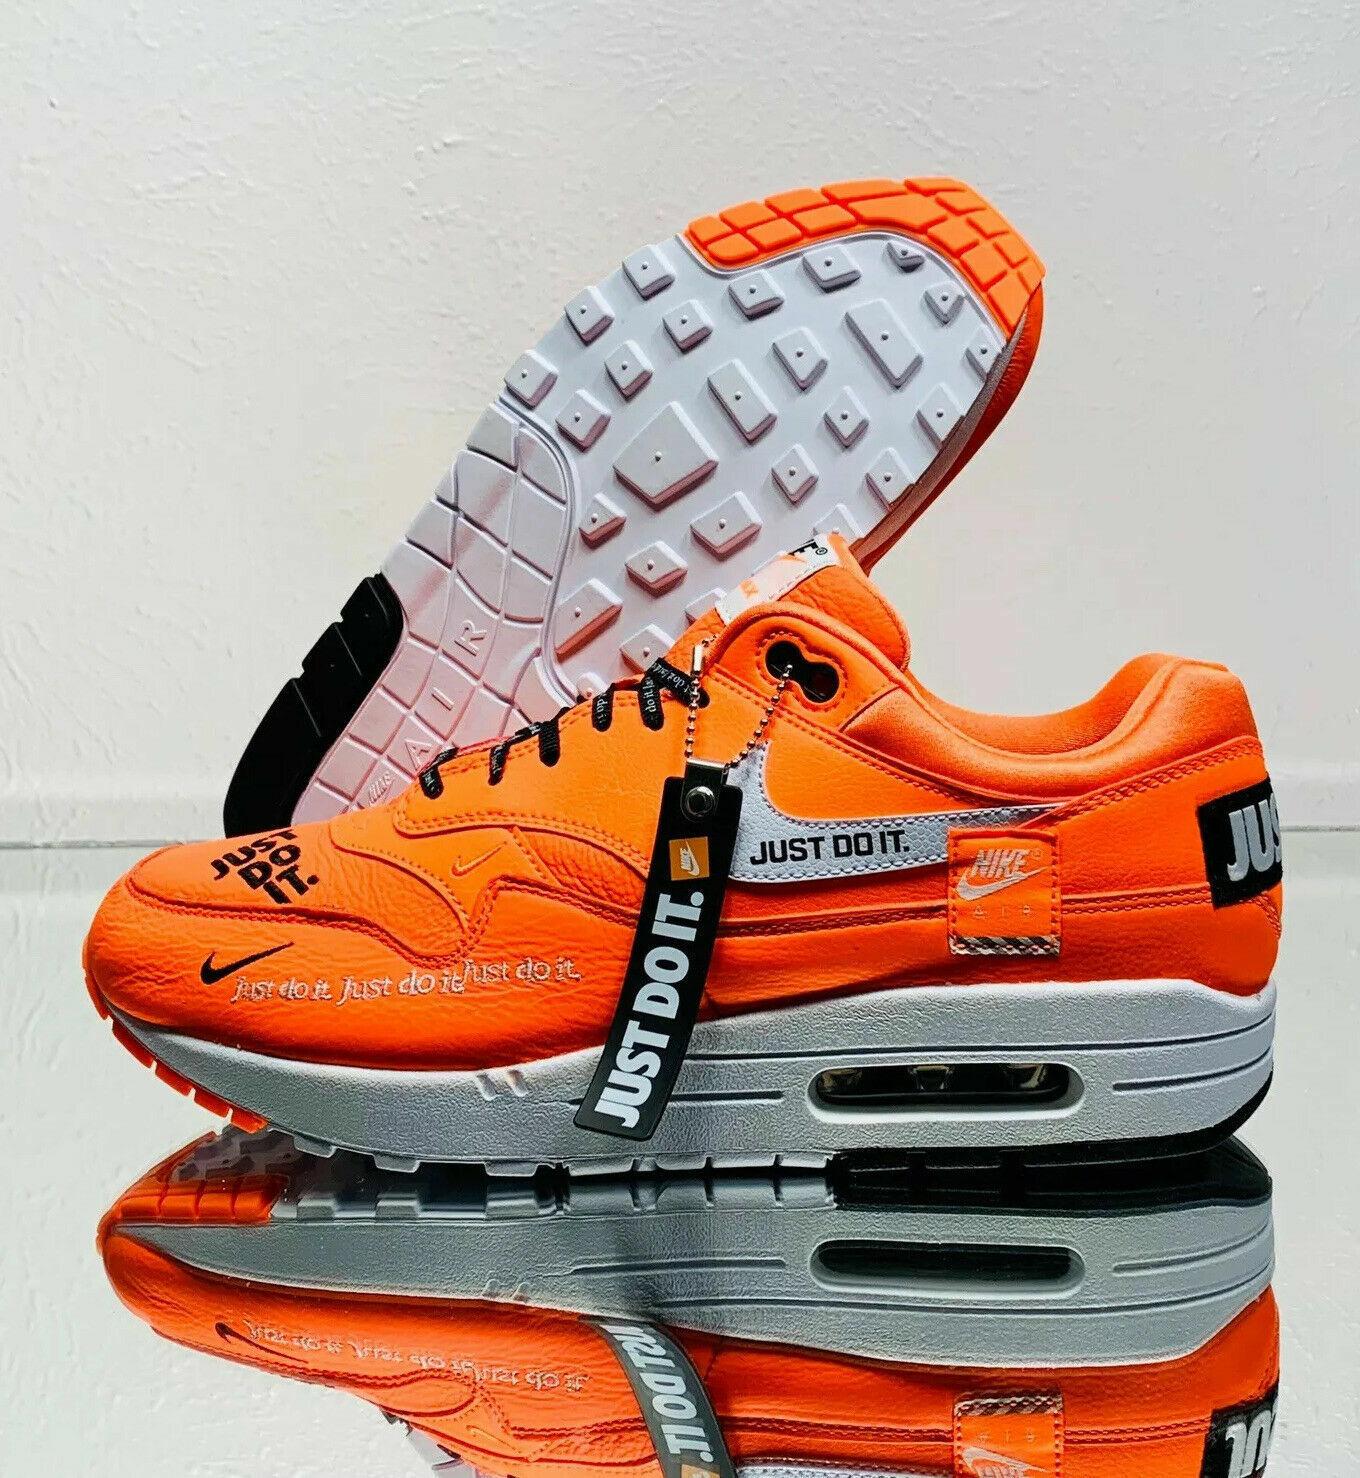 Nike Basket mode Air Max 95 Prm 538416603 Rouge 44 12